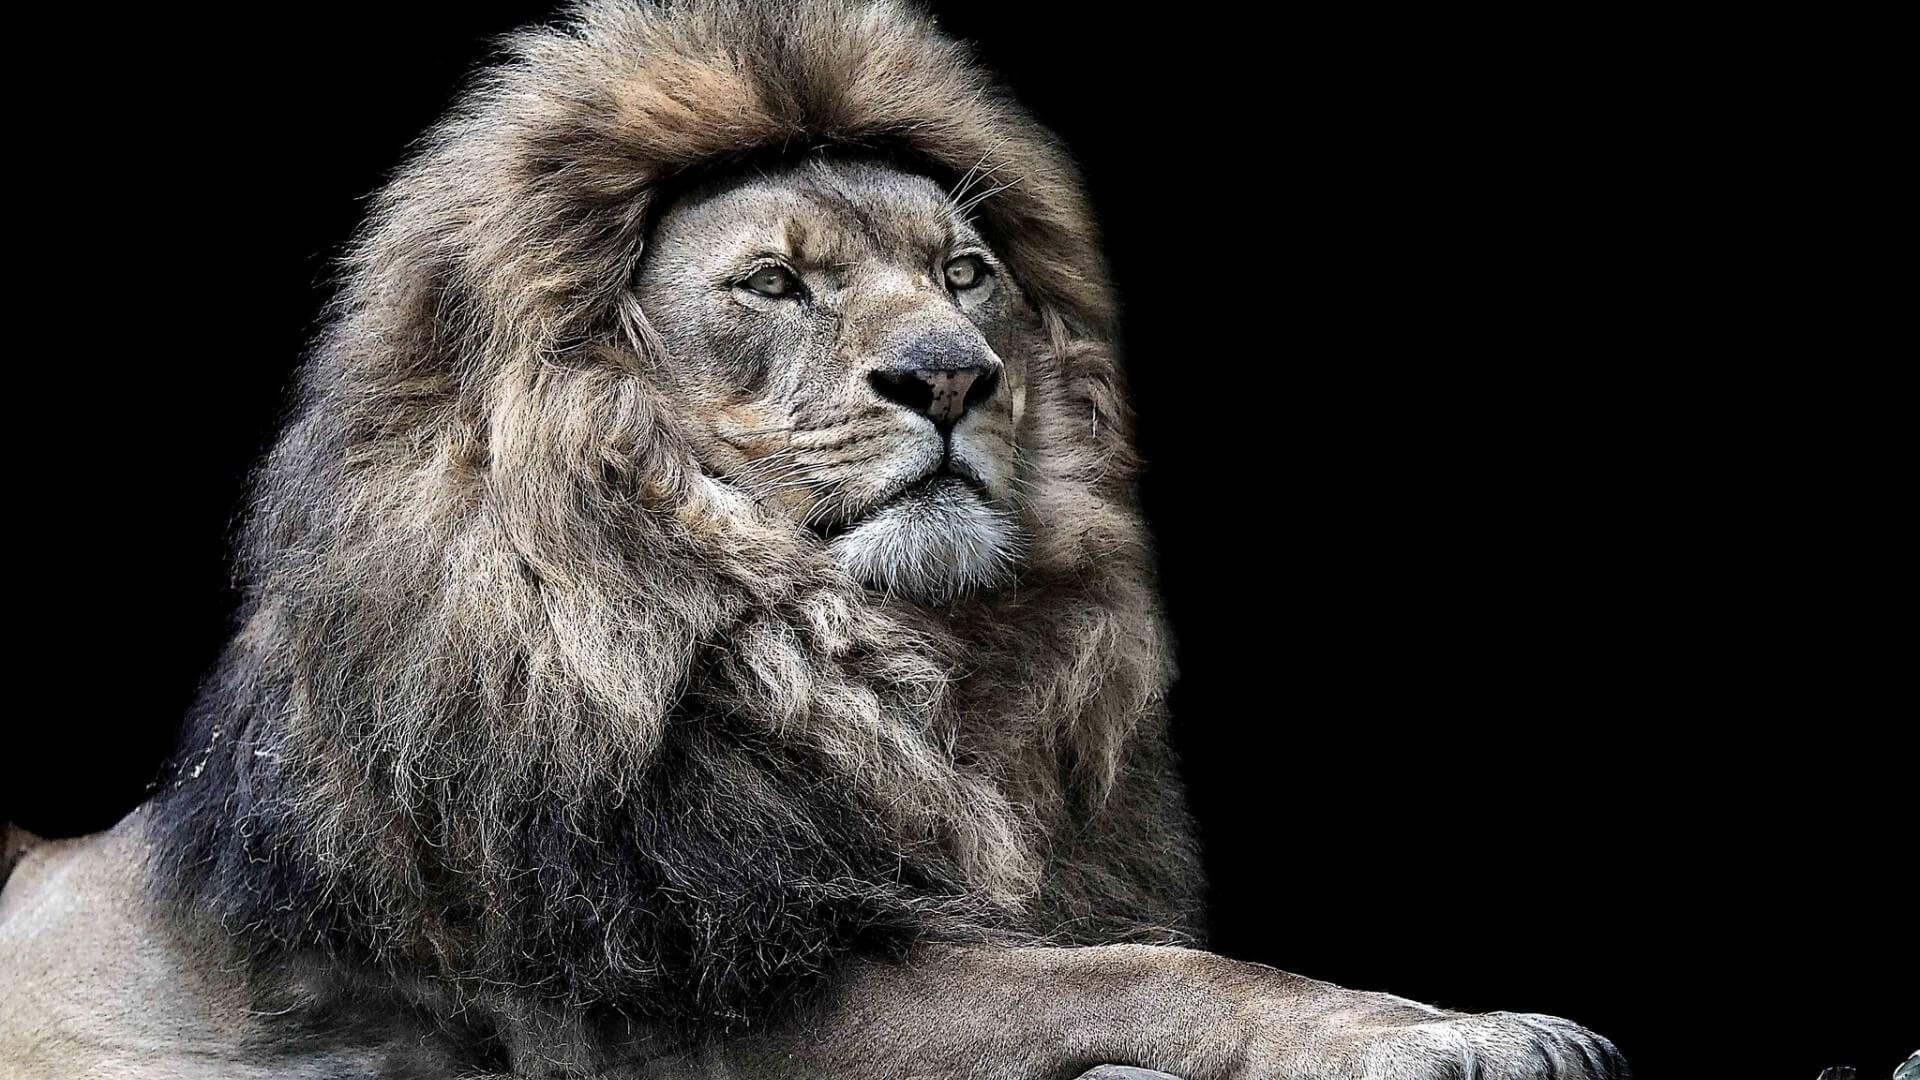 White Lion Face Wallpaper Hd 1080p Best Hd Wallpaper